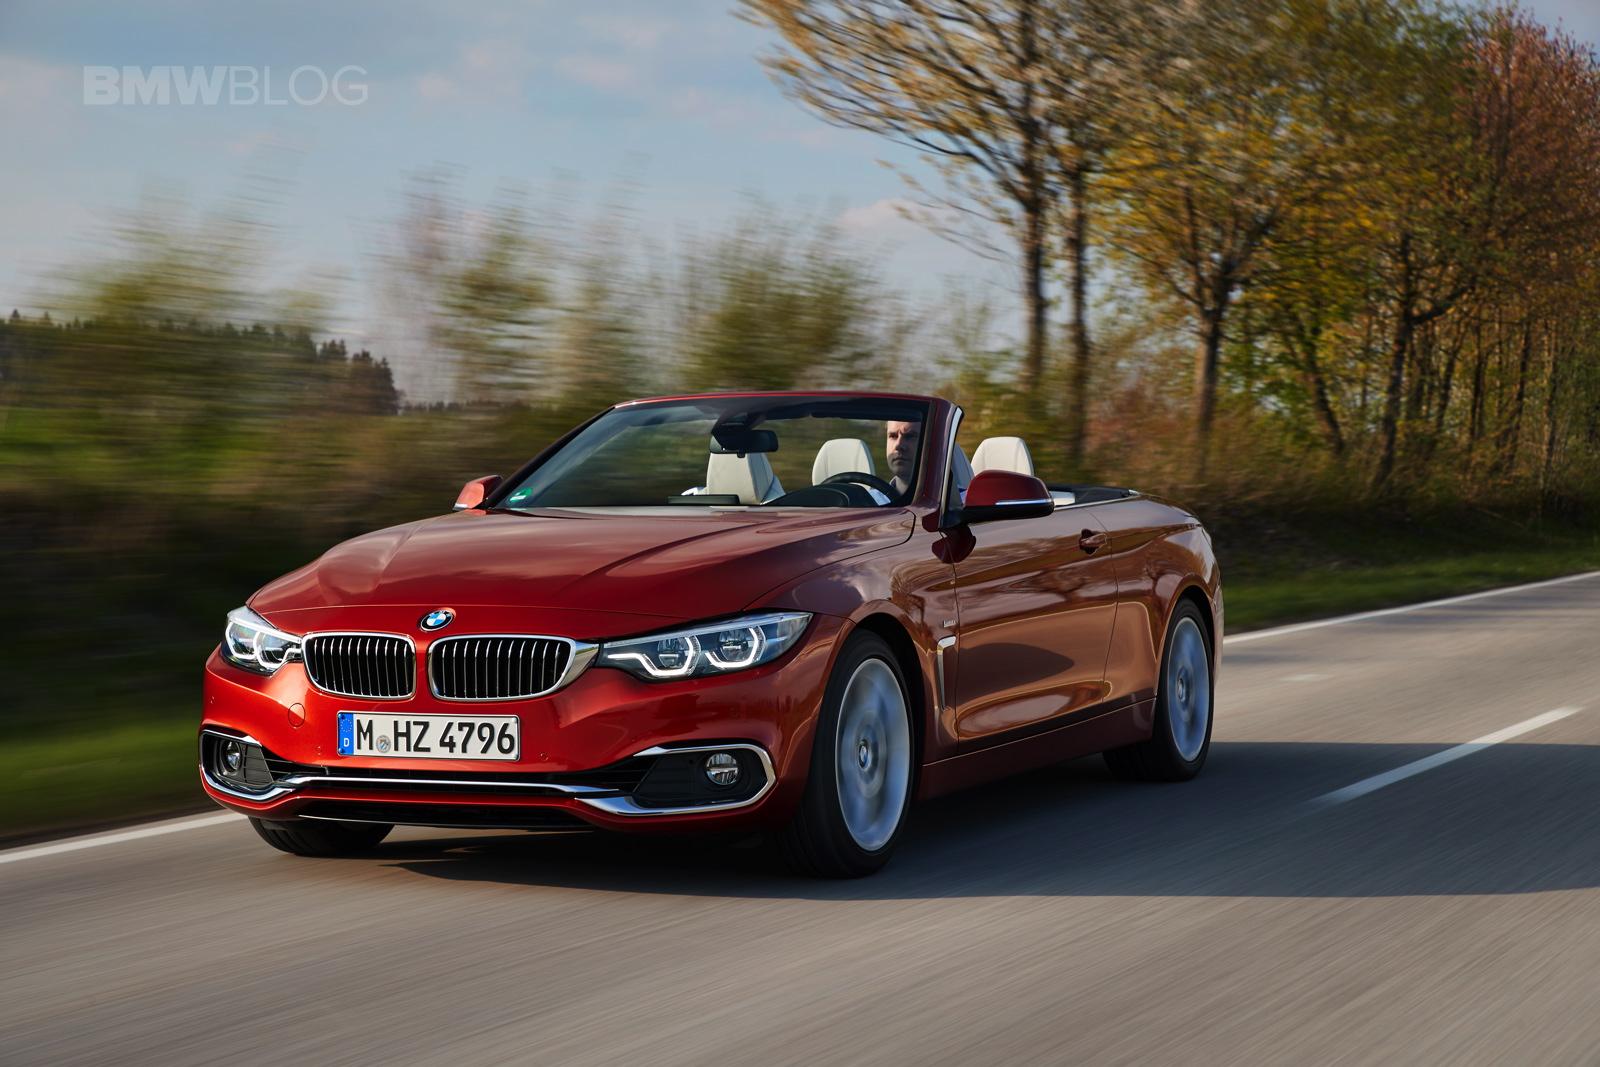 2017 BMW 4 Series Convertible test drive 07